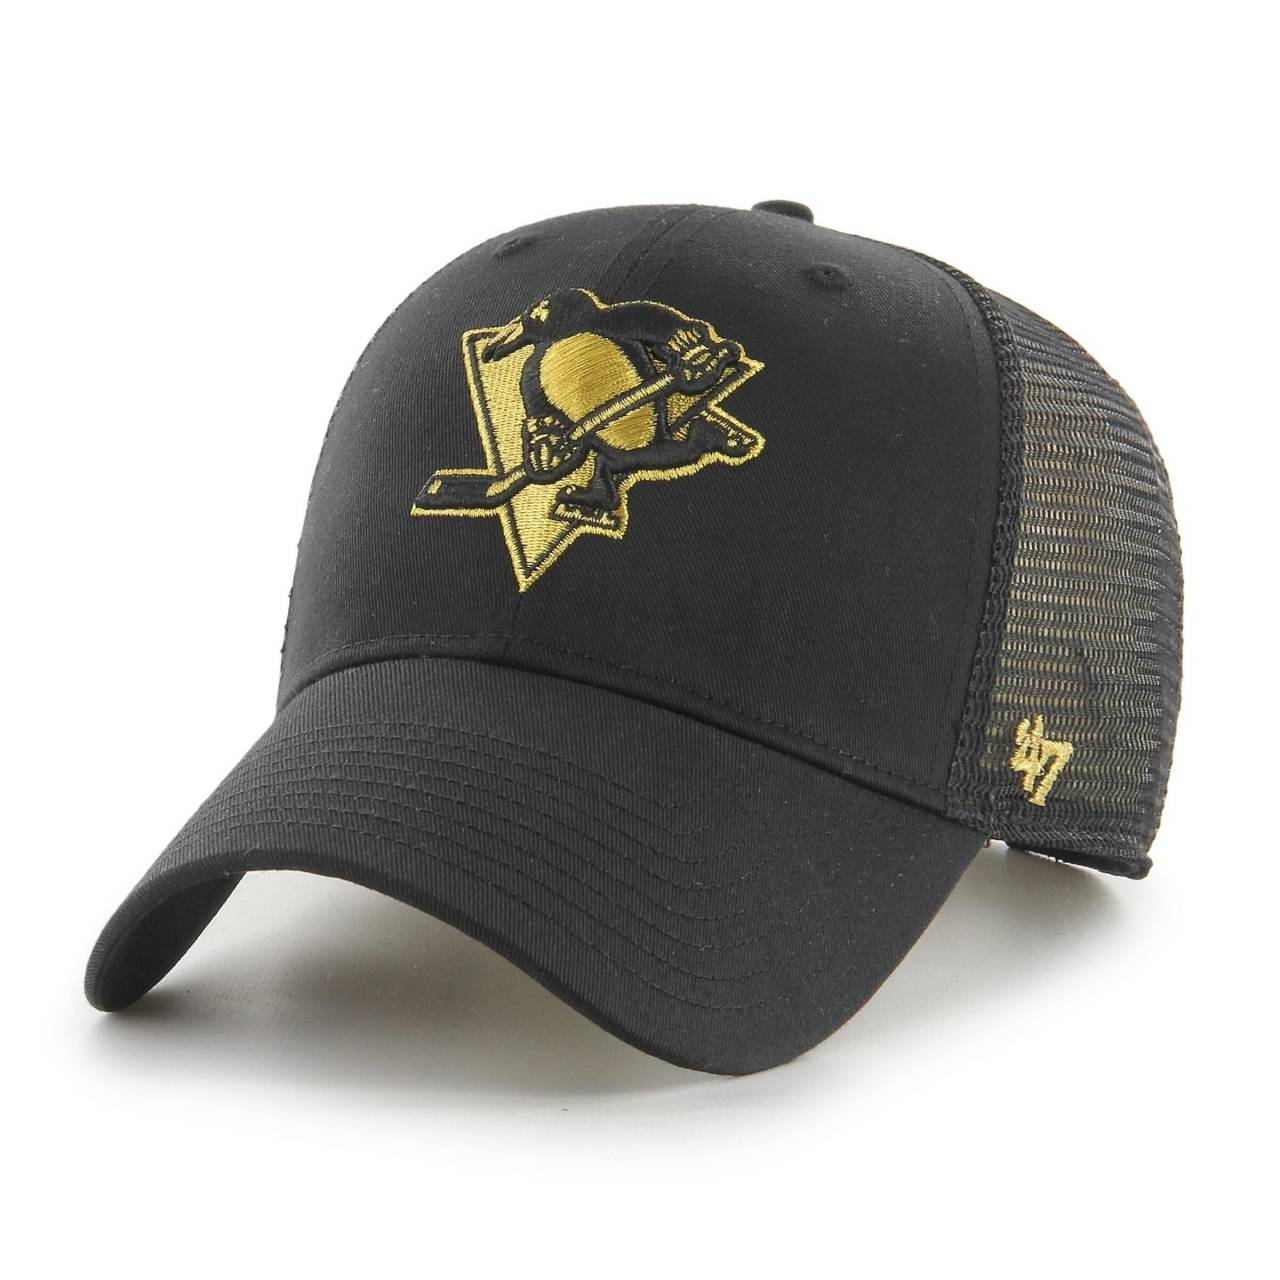 NHL PITTSBURGH PENGUINS BRANSON METALLIC '47 MVP BLACK CAP